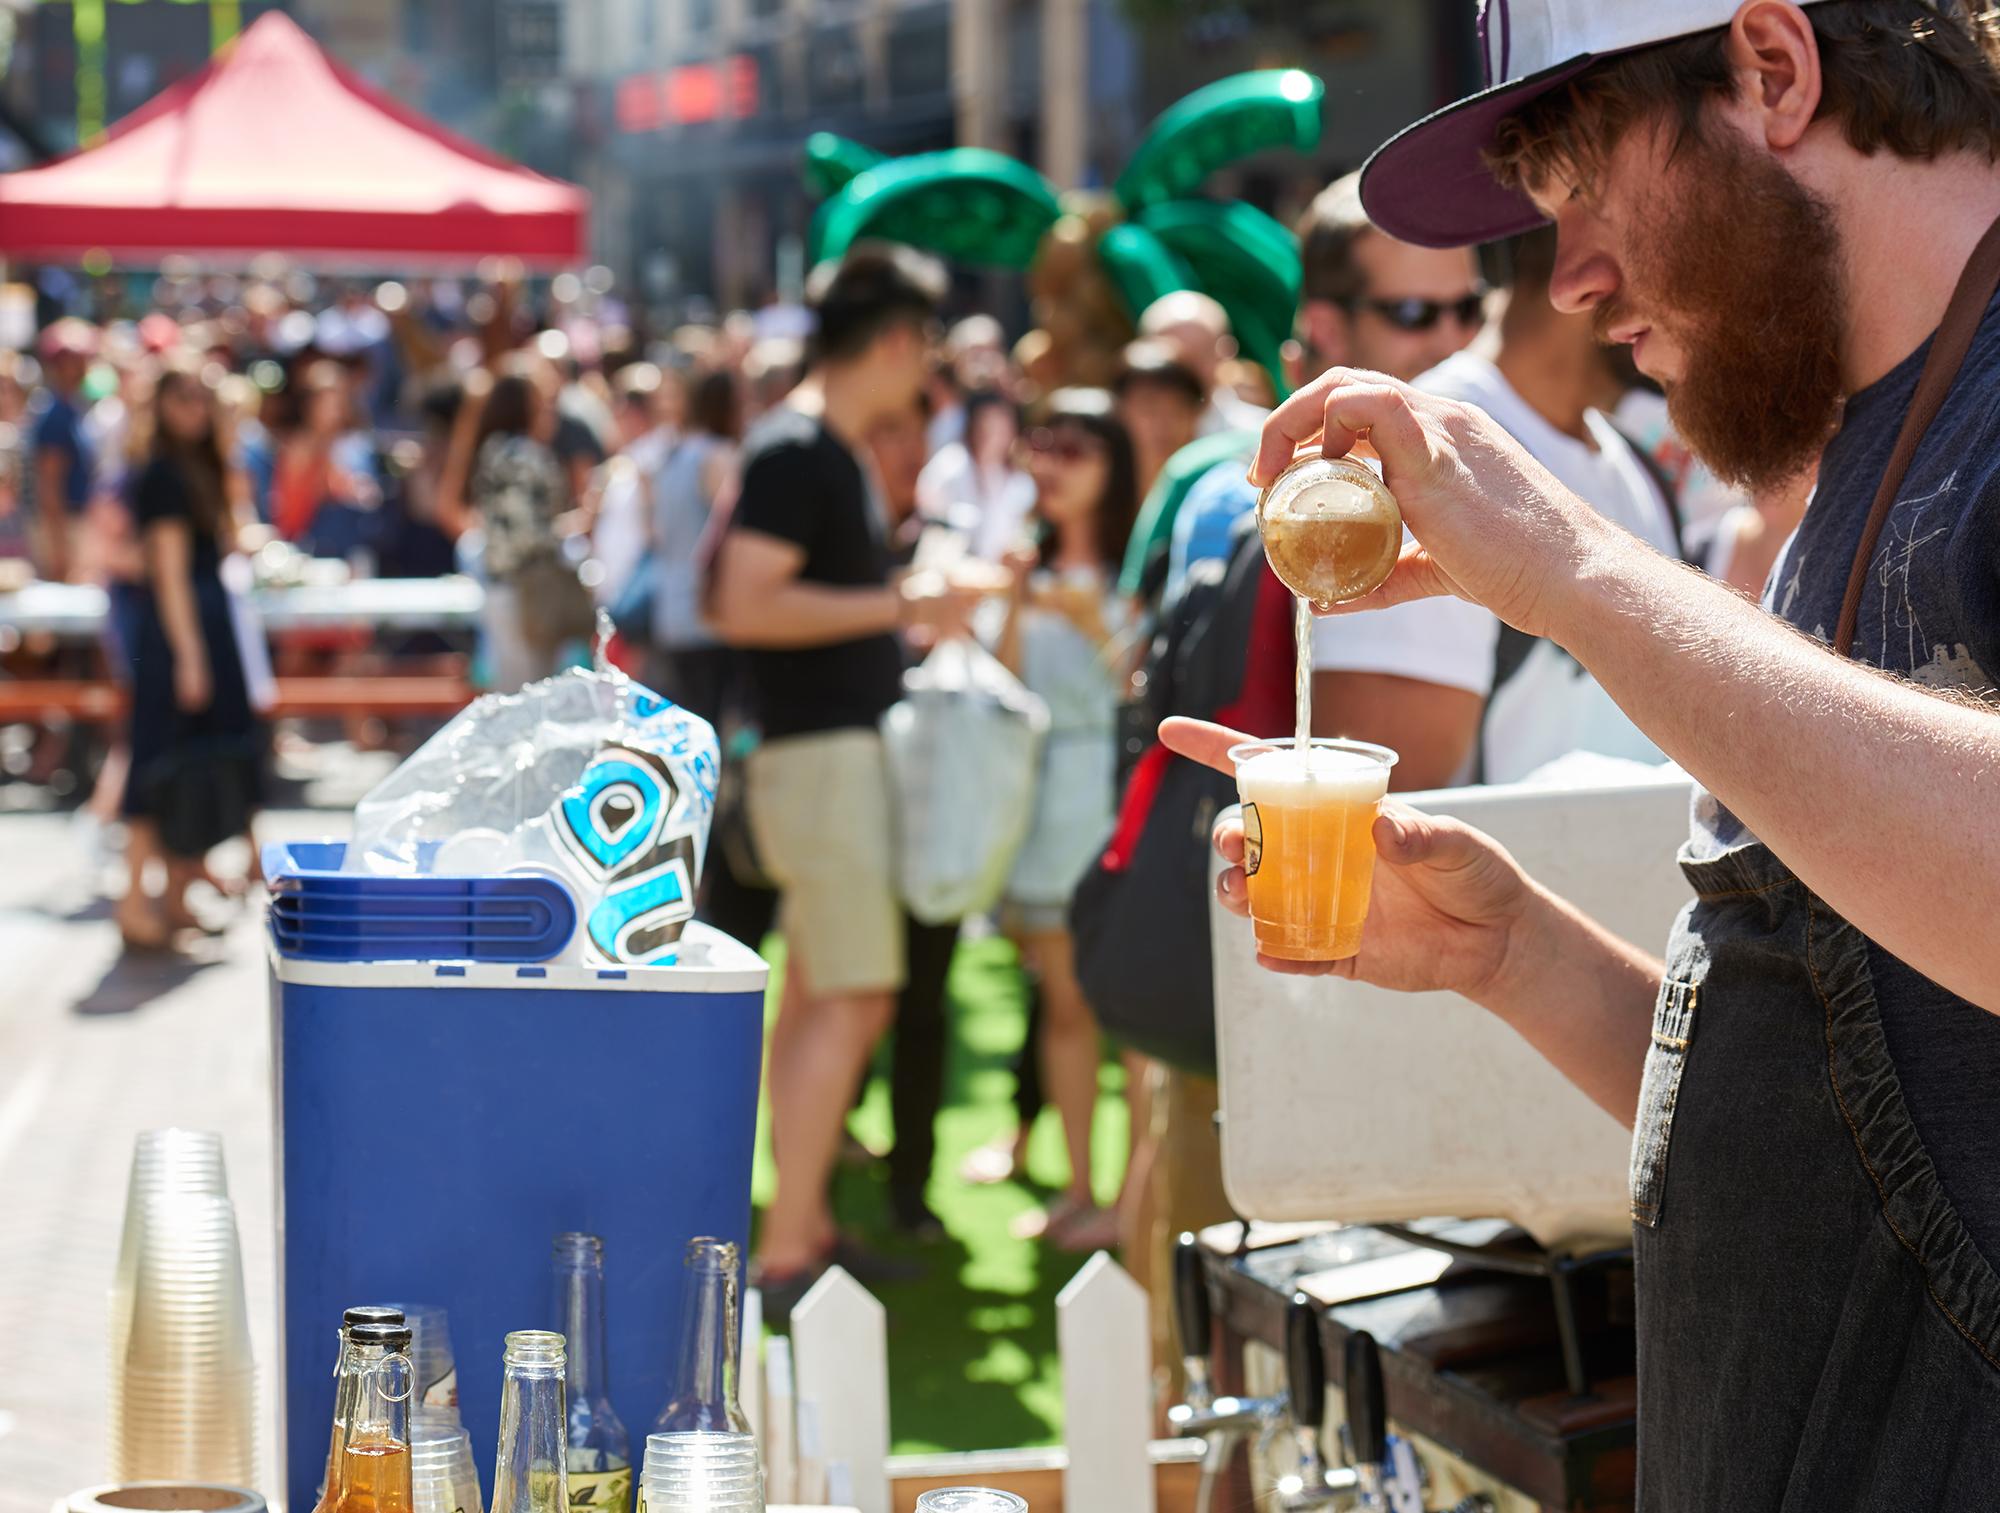 man serving beer at a street food market